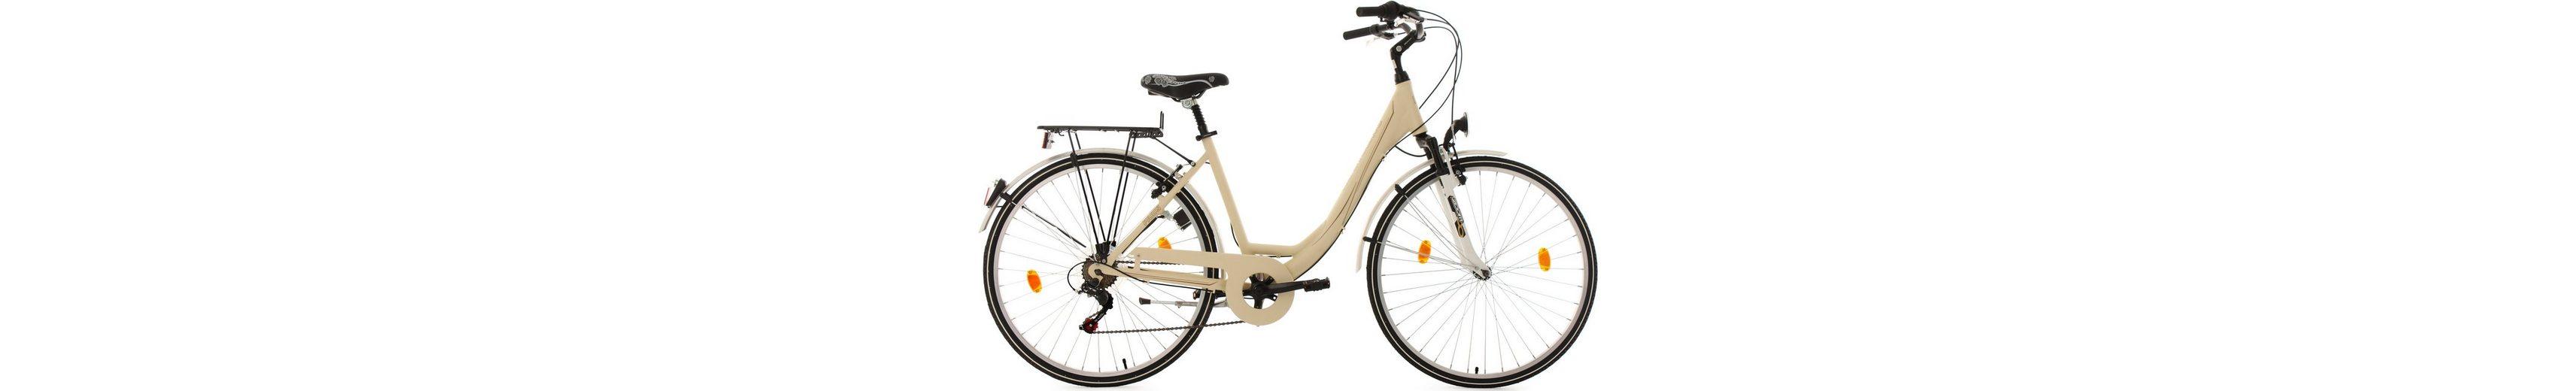 KS Cycling Damen-Cityrad, 28 Zoll, 6 Gang Shimano-Tourney-Kettenschaltung, »Paris«